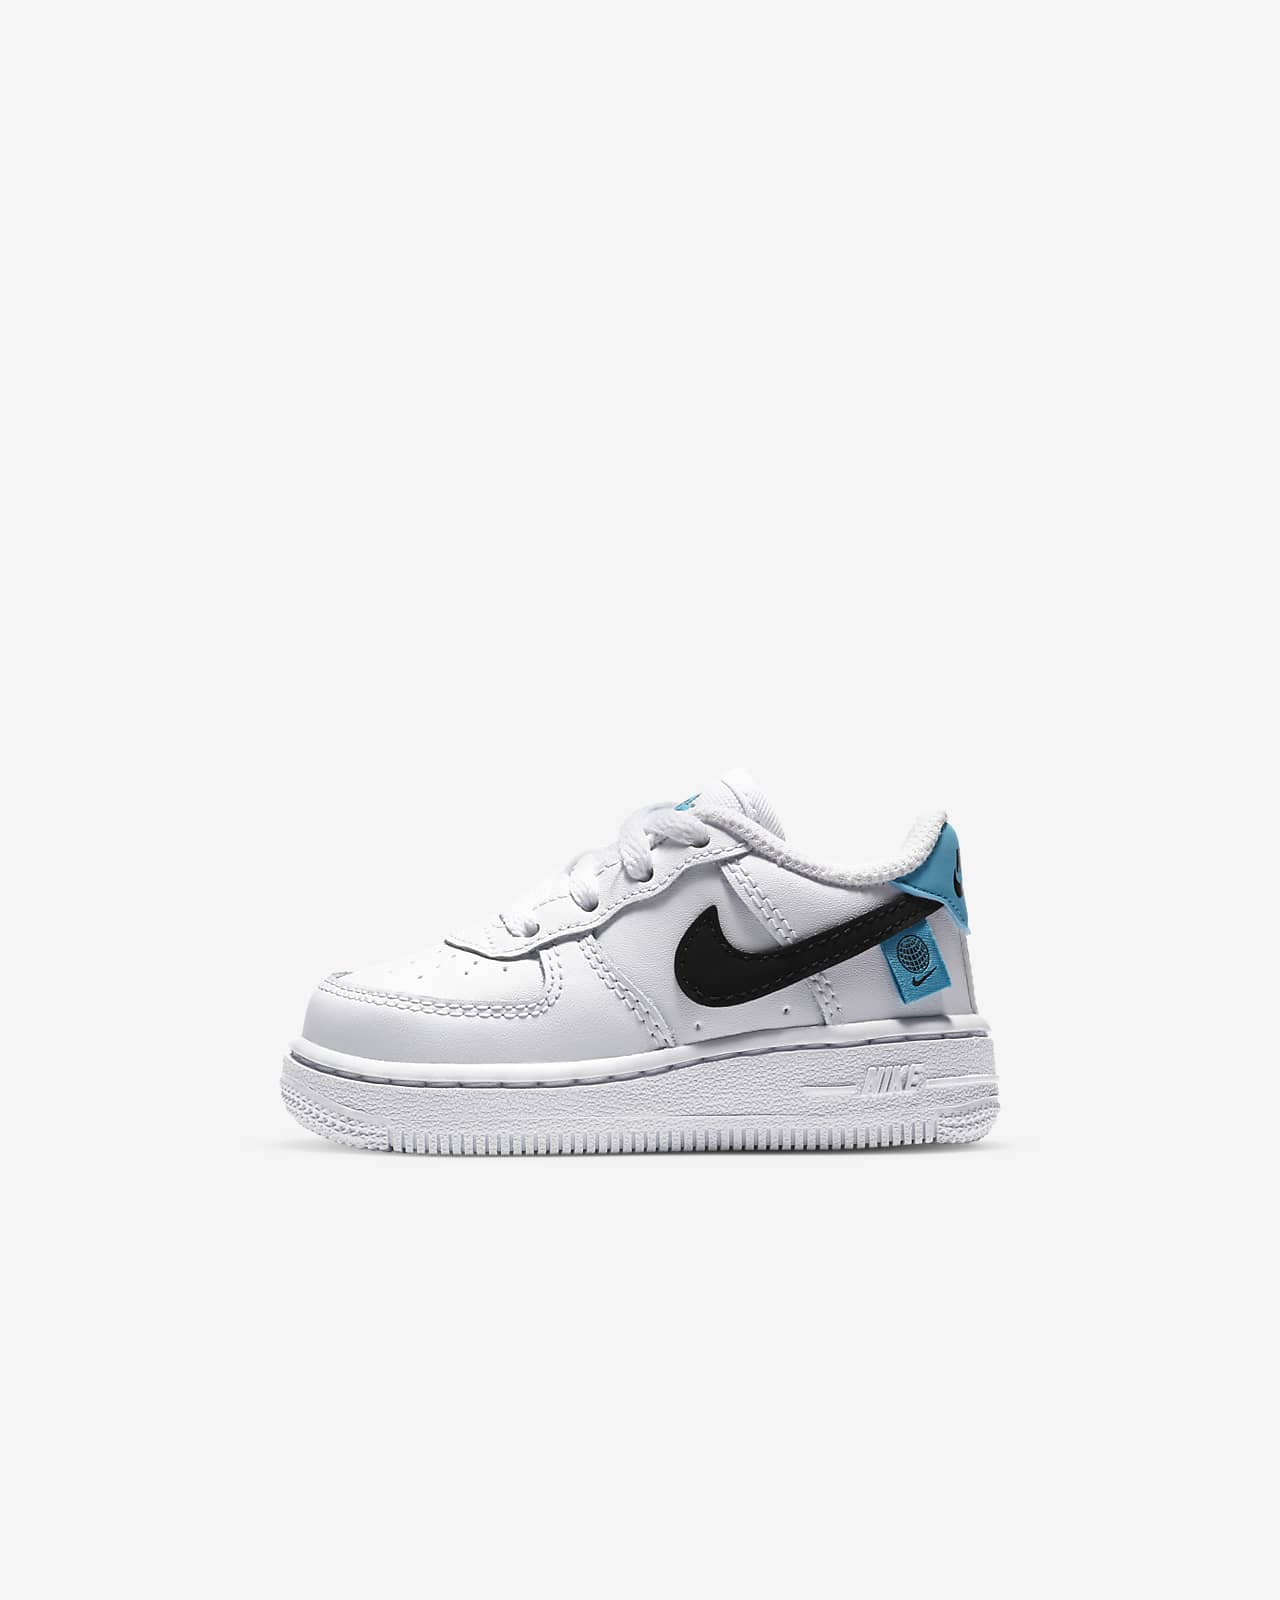 Sko Nike Force 1 WW för baby/små barn